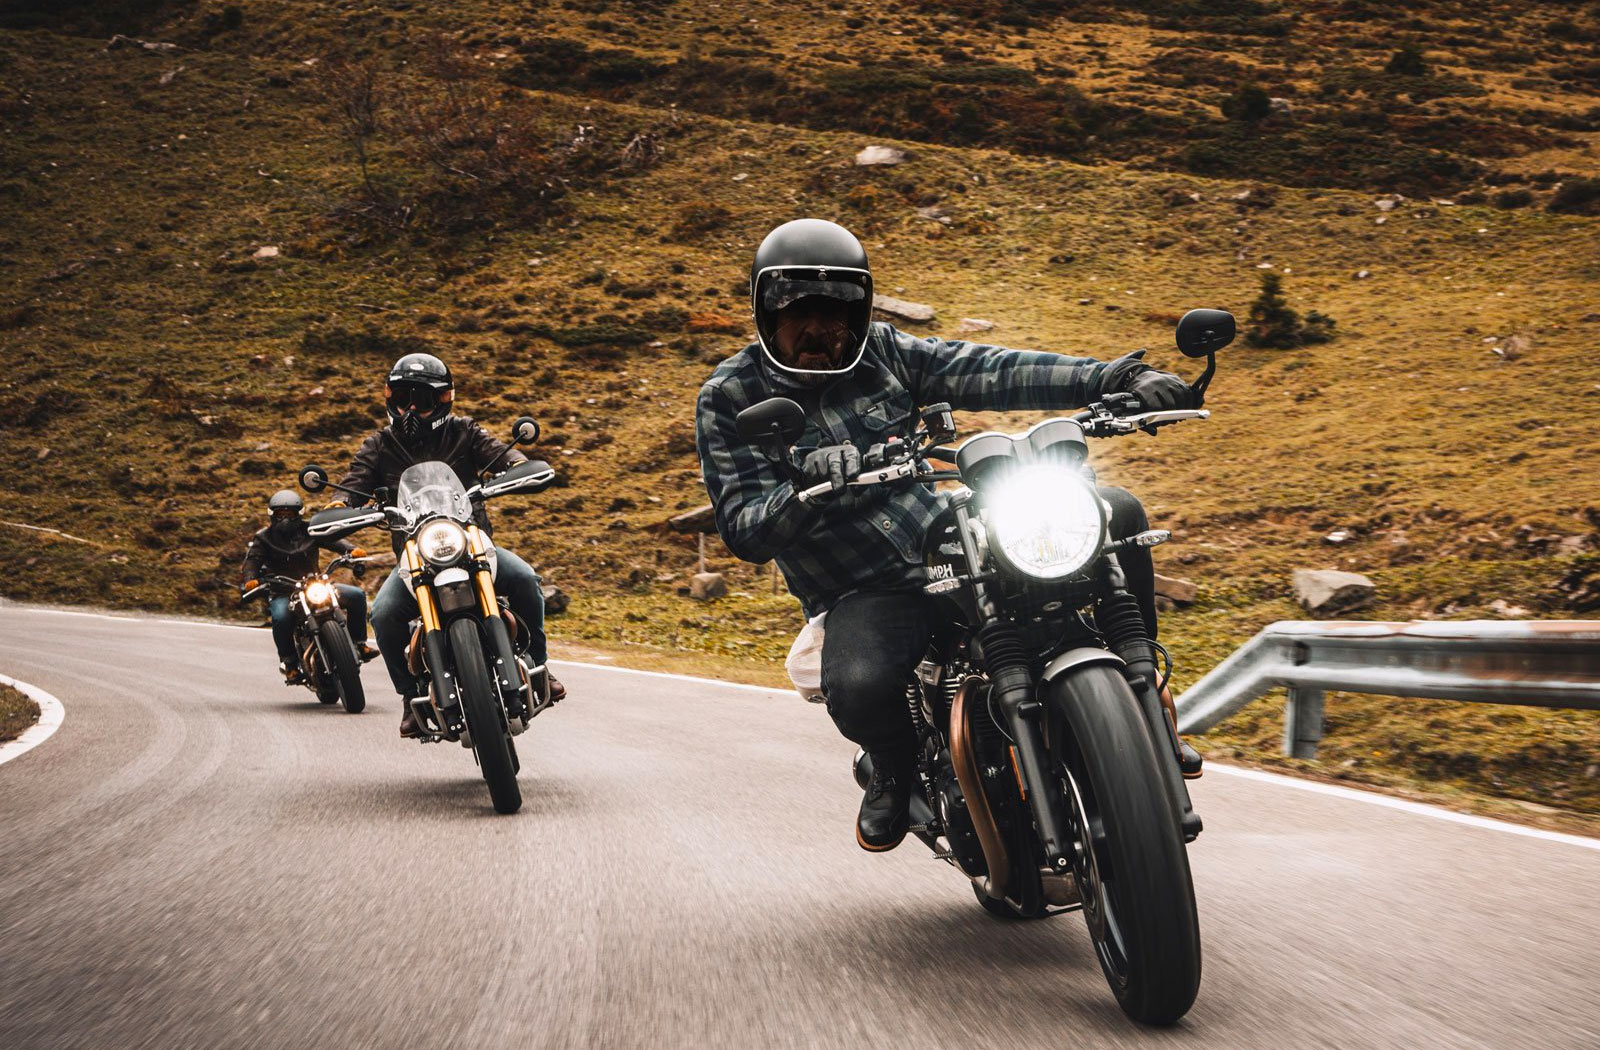 Rokker Company motorcycle riding shirts